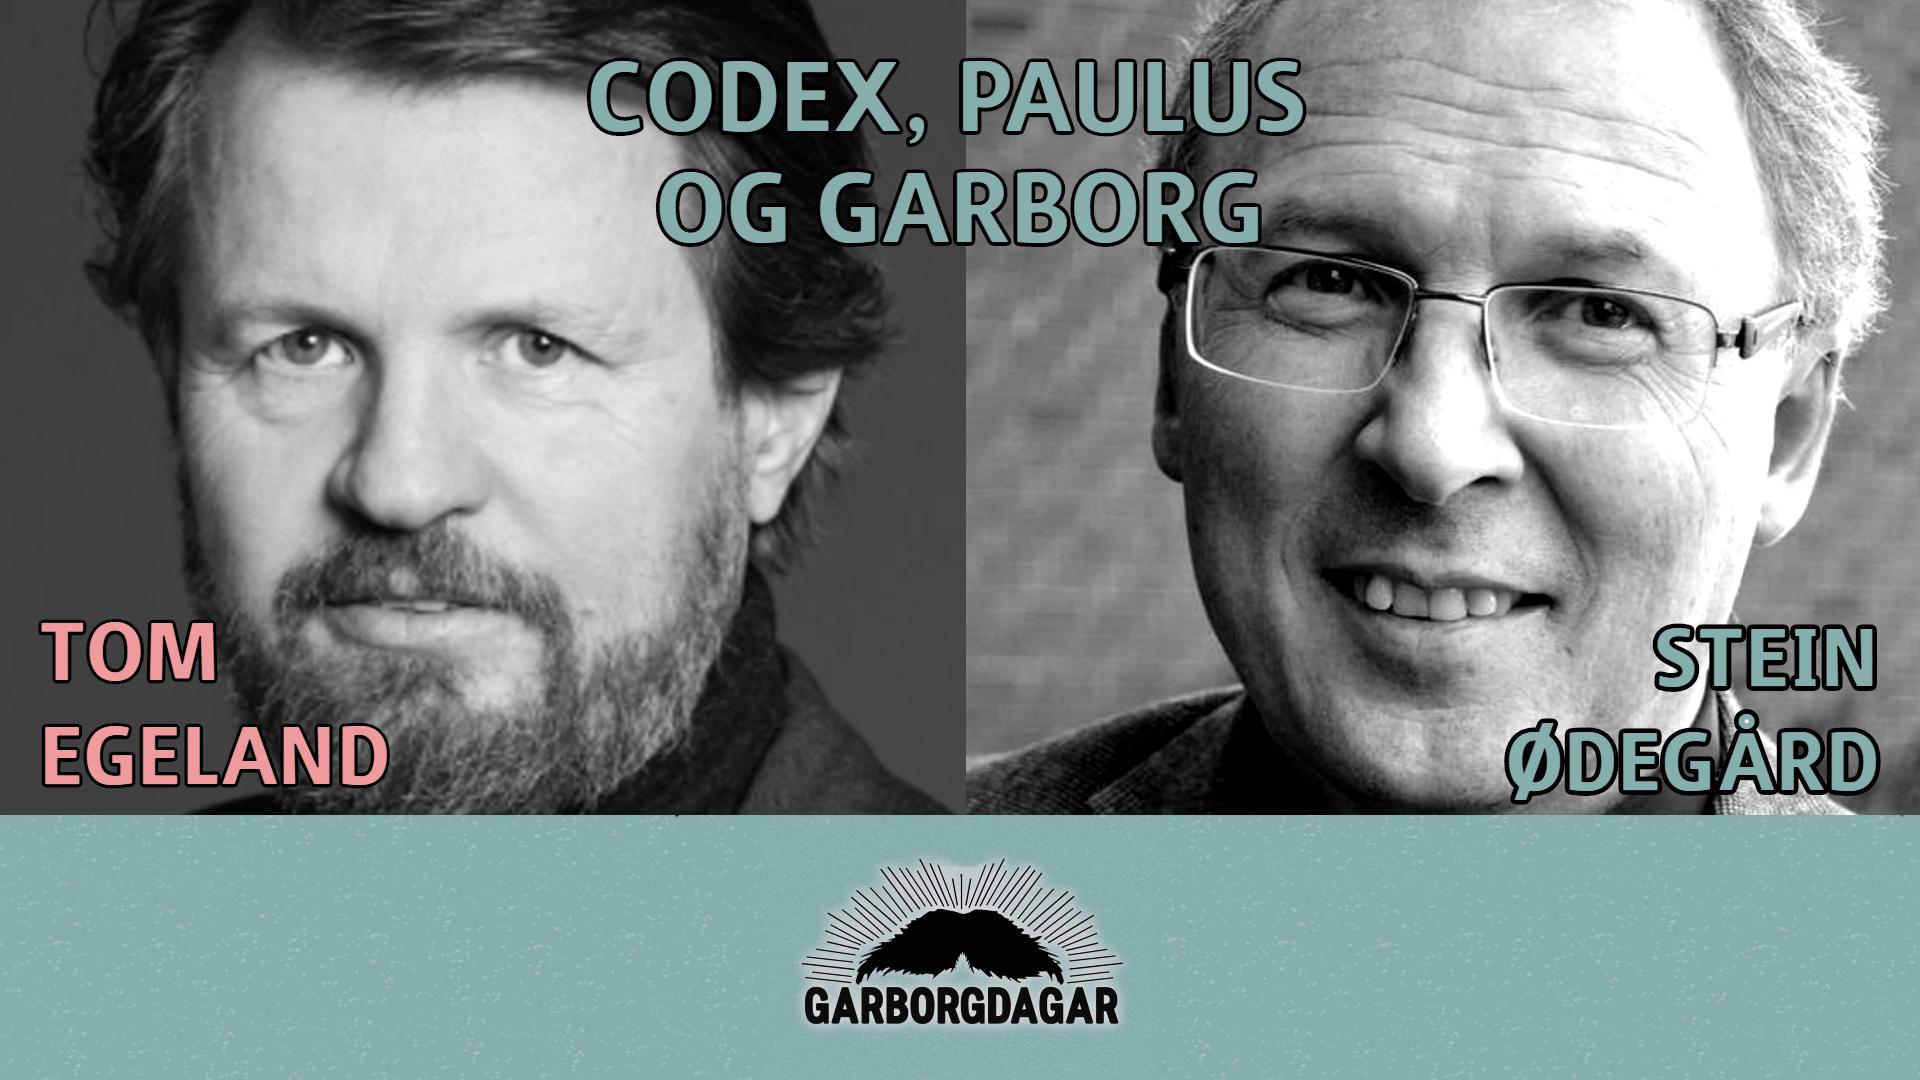 Codex,  Paulus  og  Garborg  |  Tom  Egeland  og  Stein  Ødegård